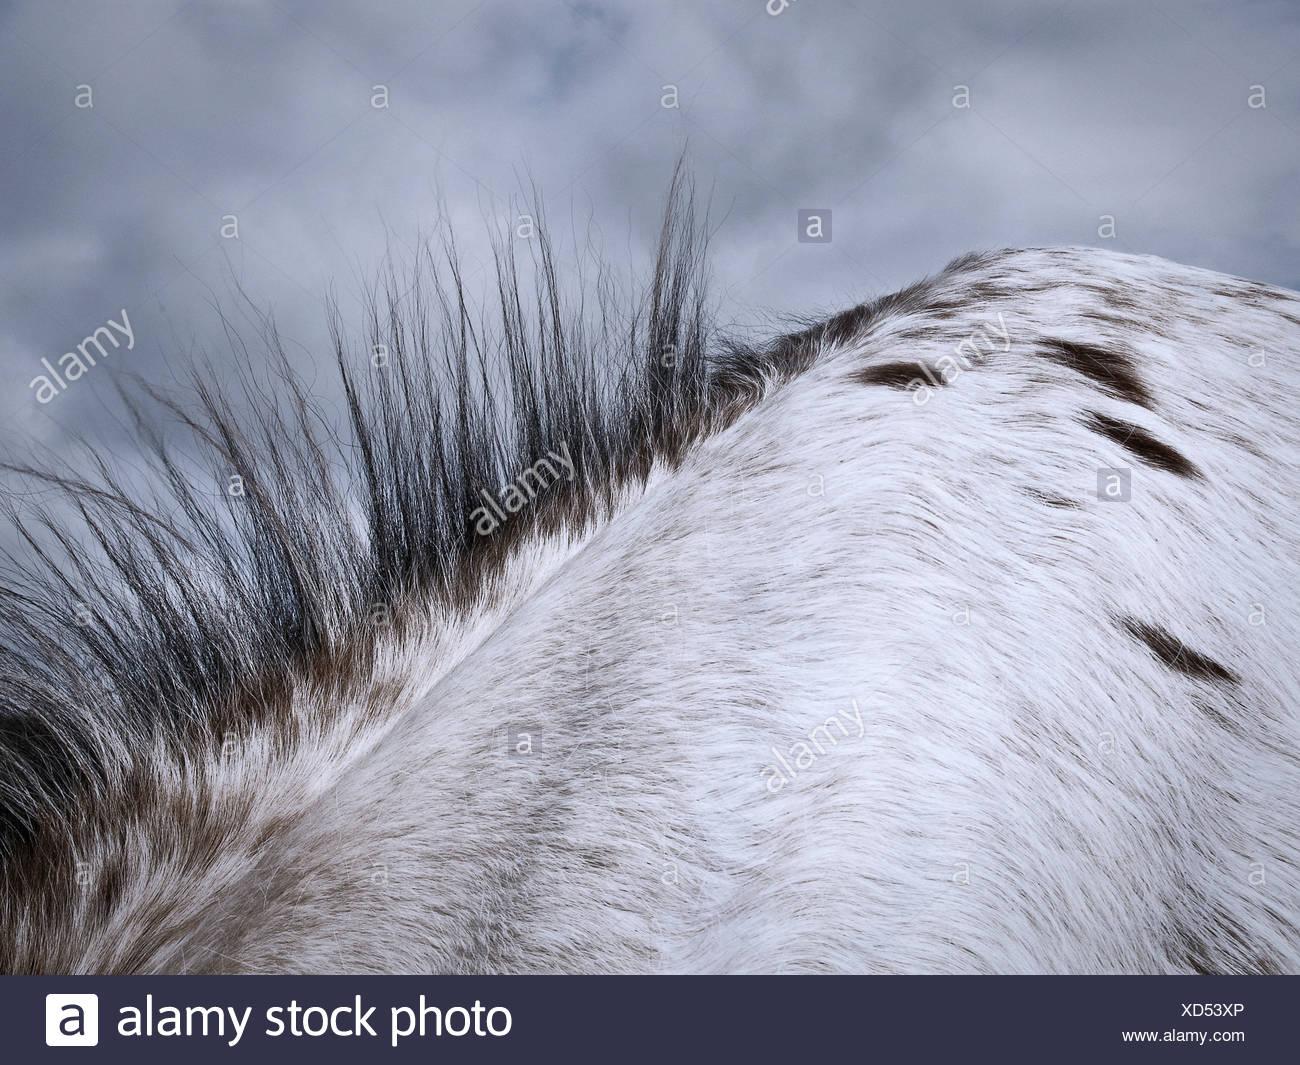 Close up of horse's mane - Stock Image